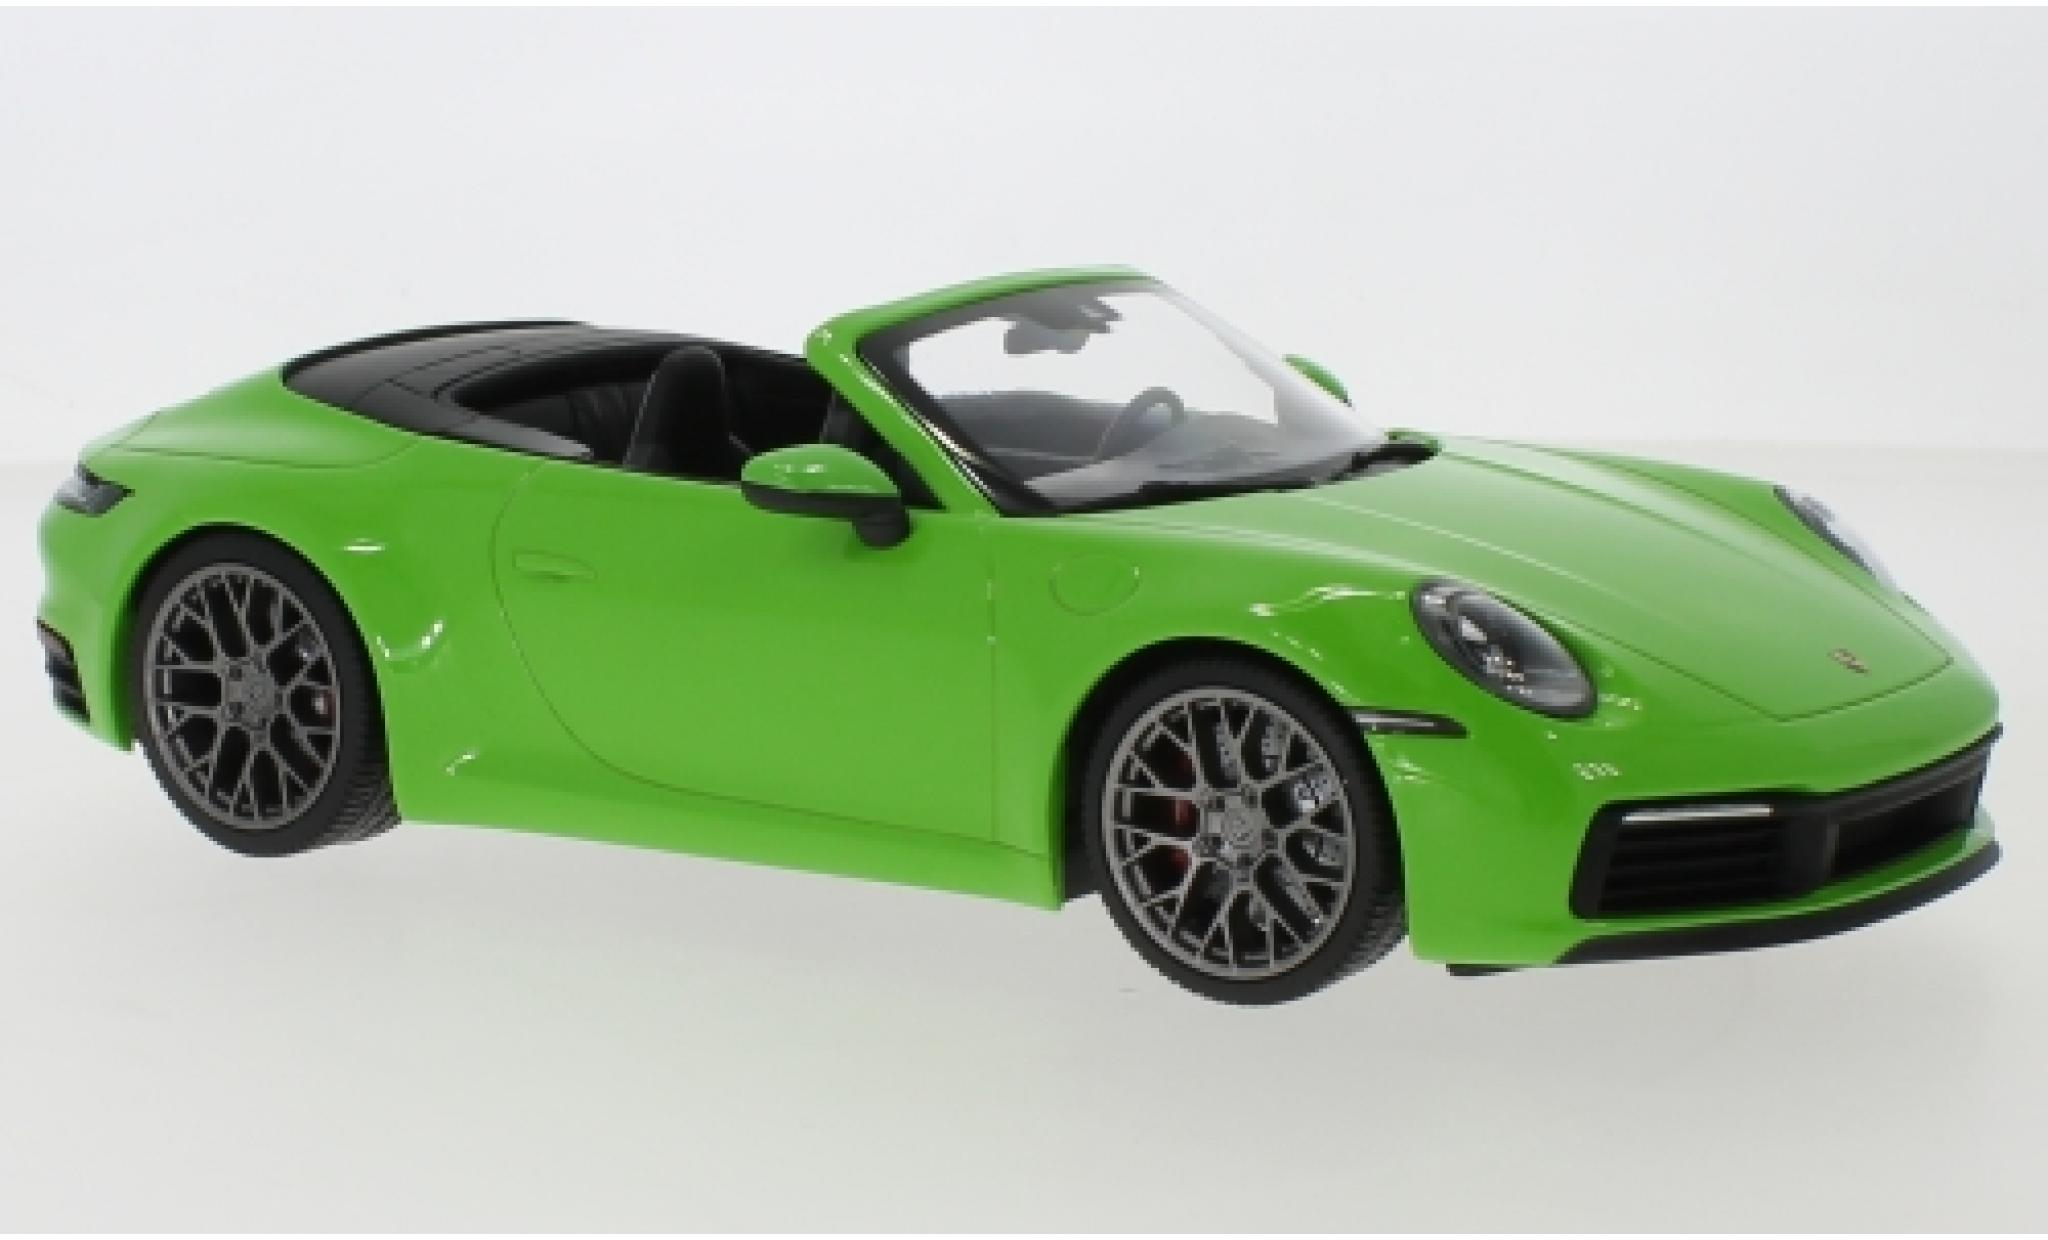 Porsche 911 1/18 I Minichamps (992) Carrera 4S Cabriolet métallisé verte 2019